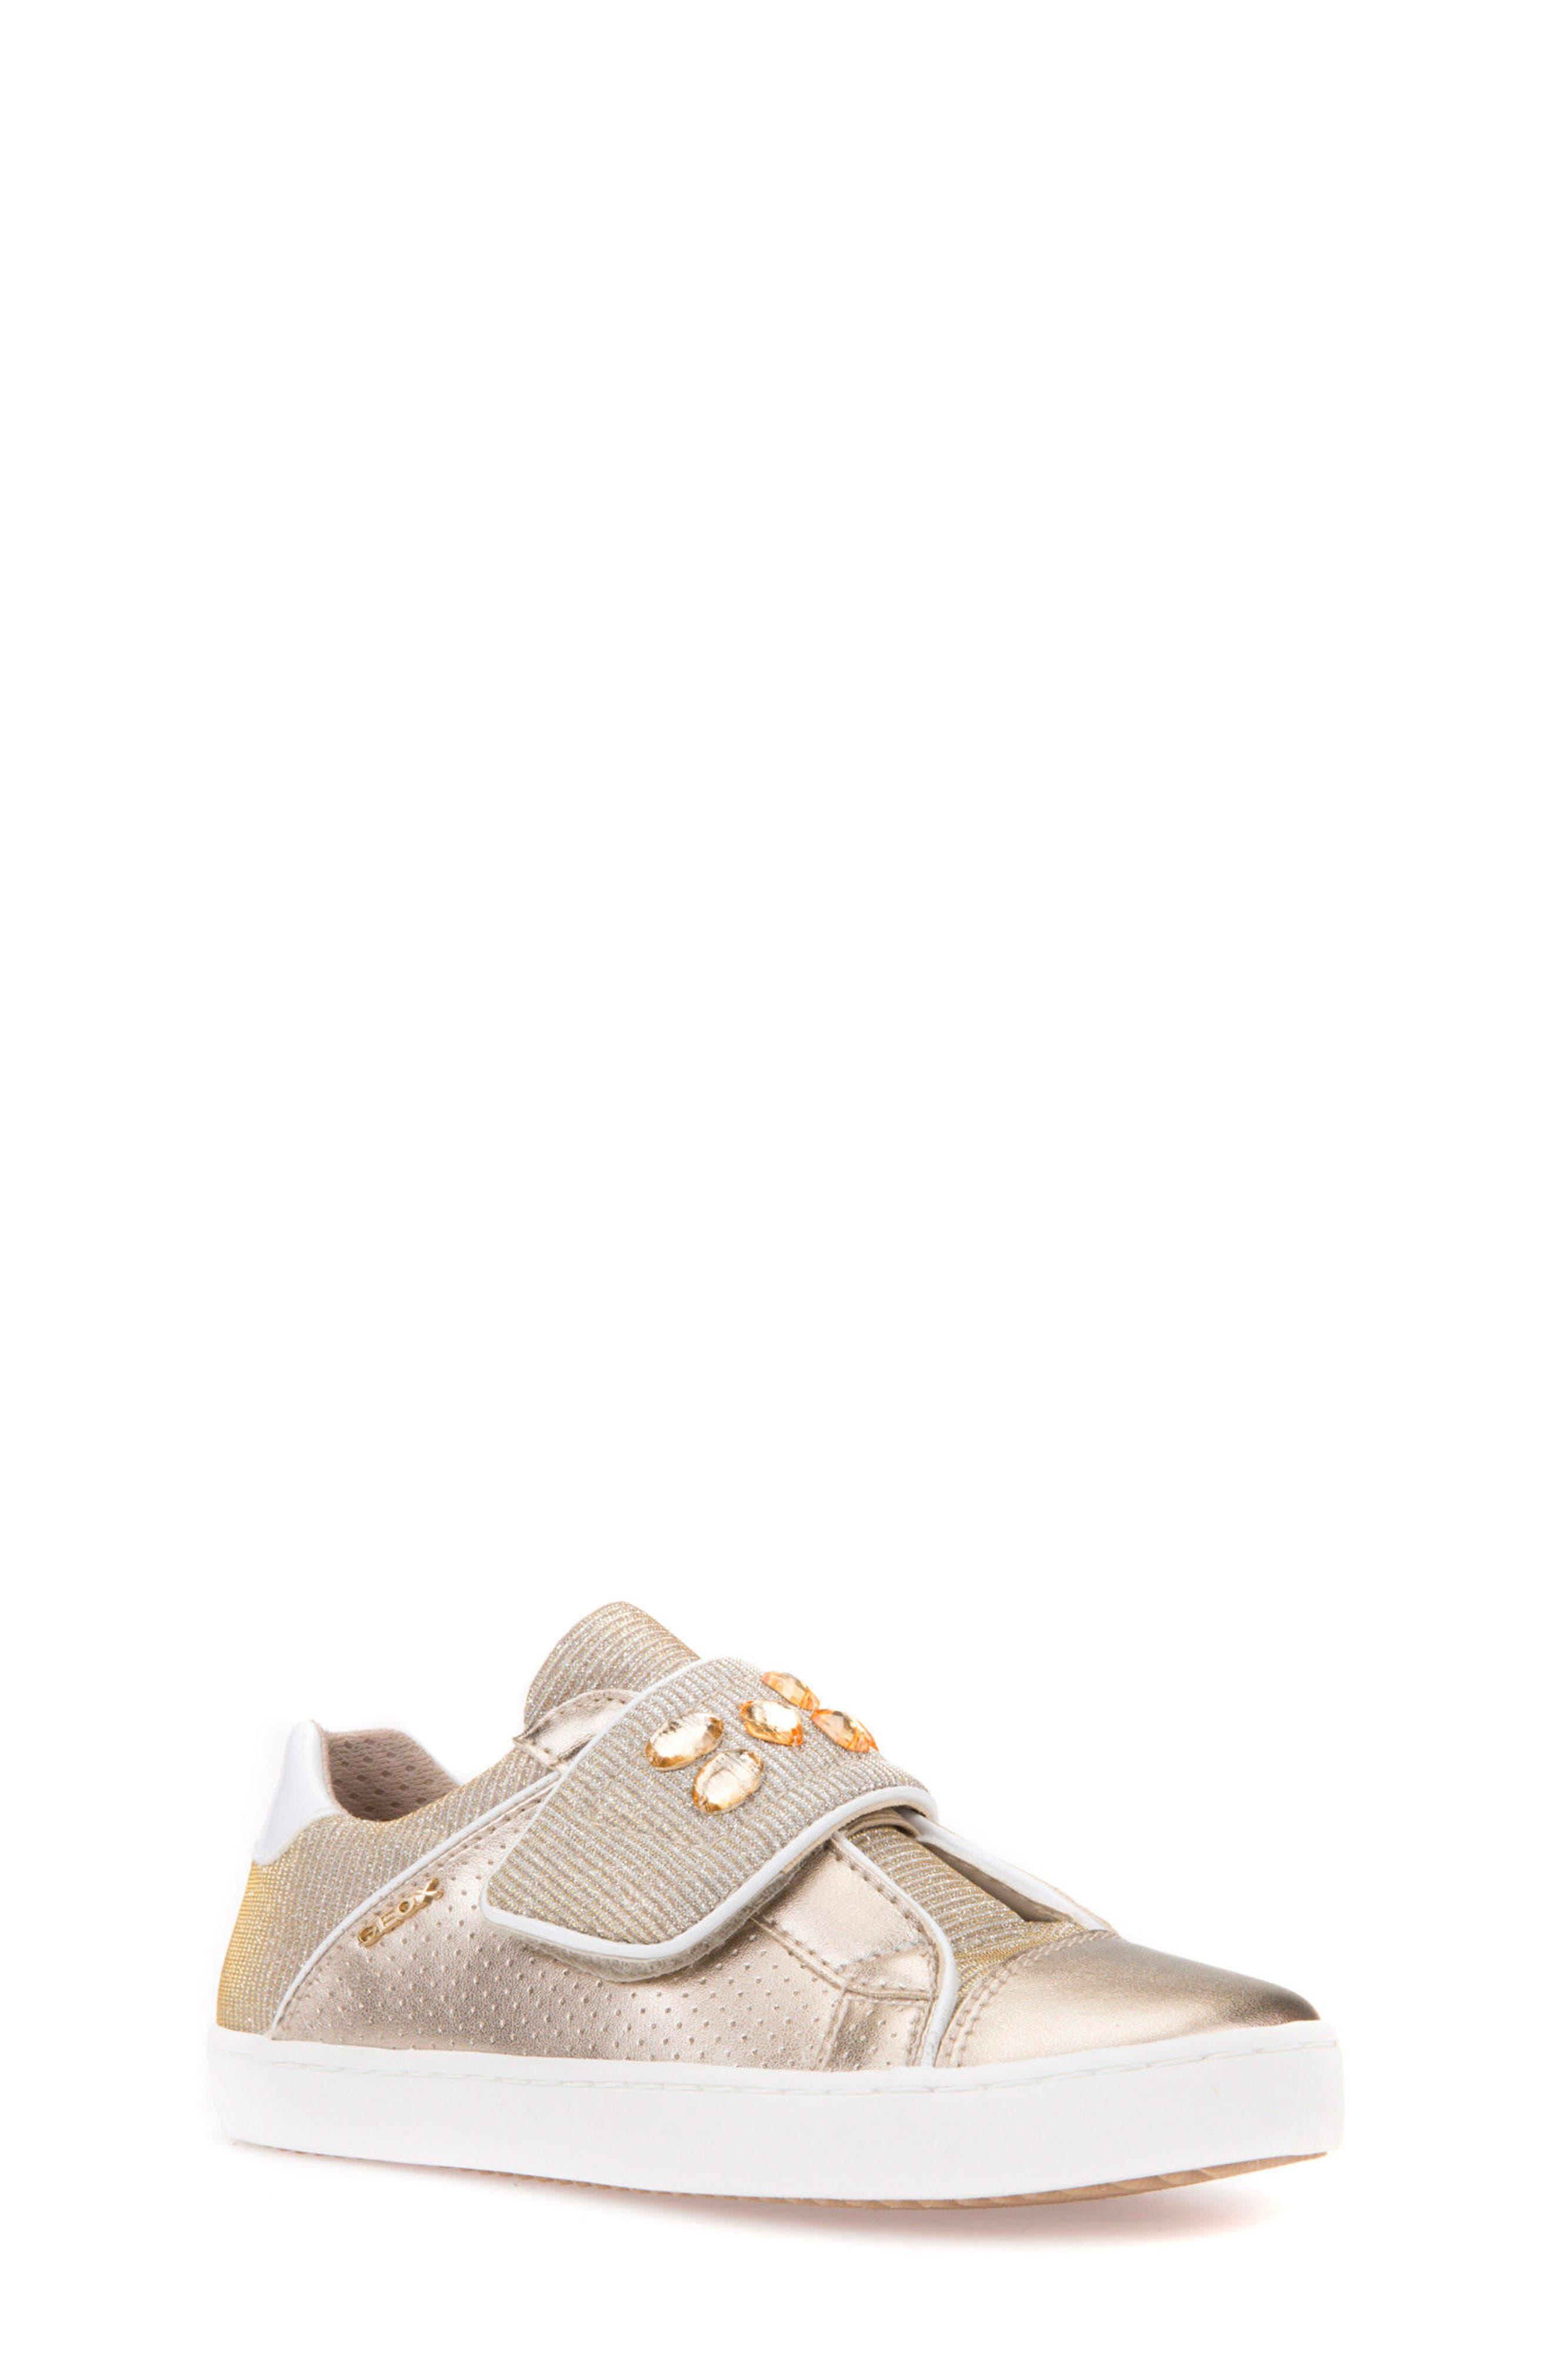 Kilwi Metallic Embellished Sneaker,                         Main,                         color, GOLD